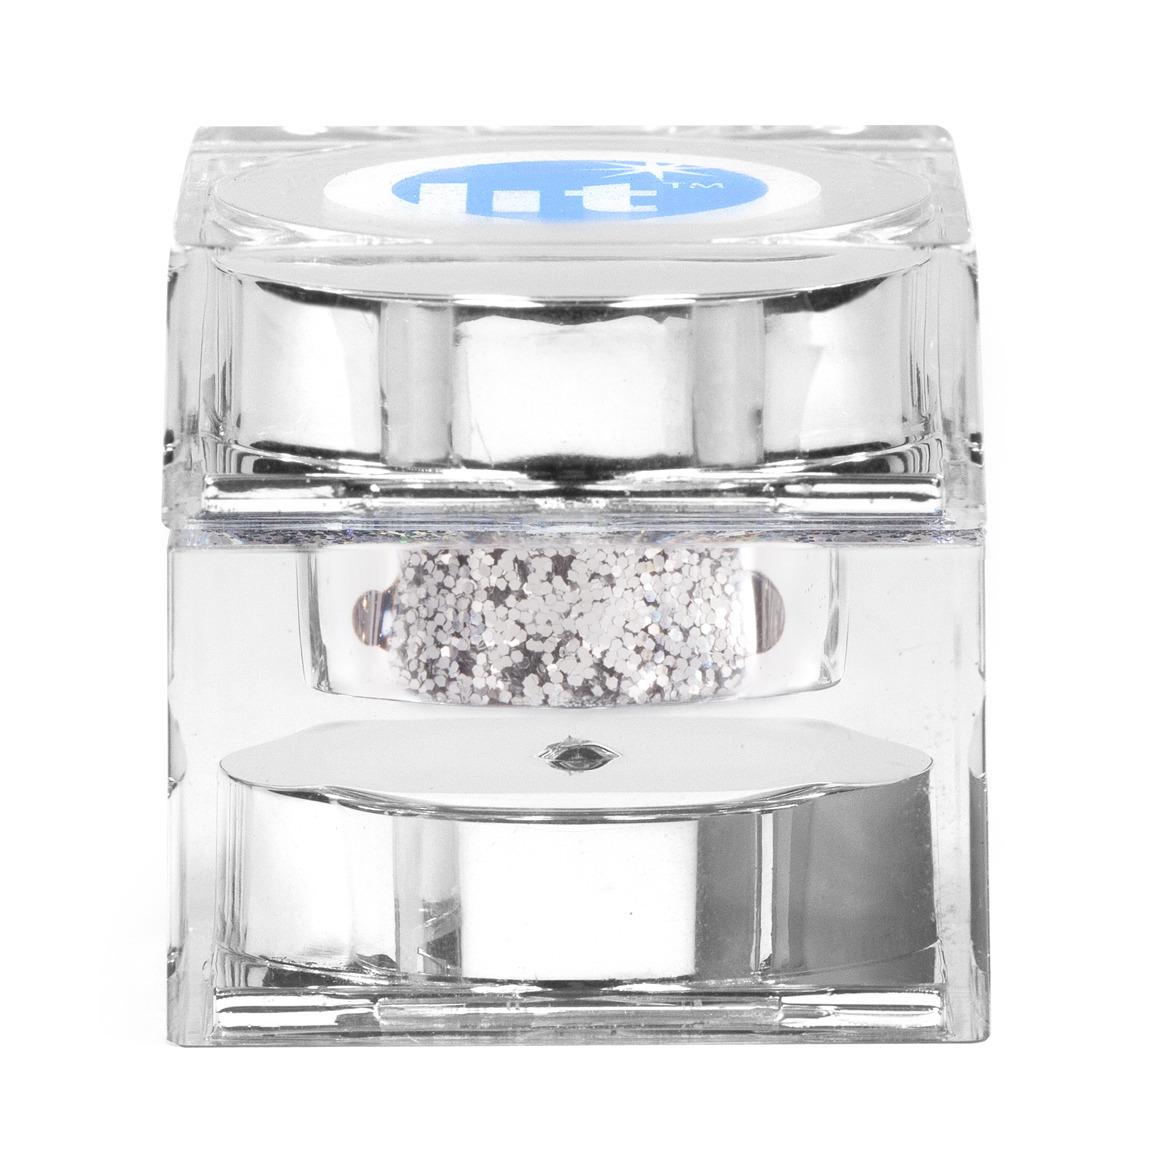 Lit Cosmetics Lit Glitter Marilin Monroe S4 (Solid)